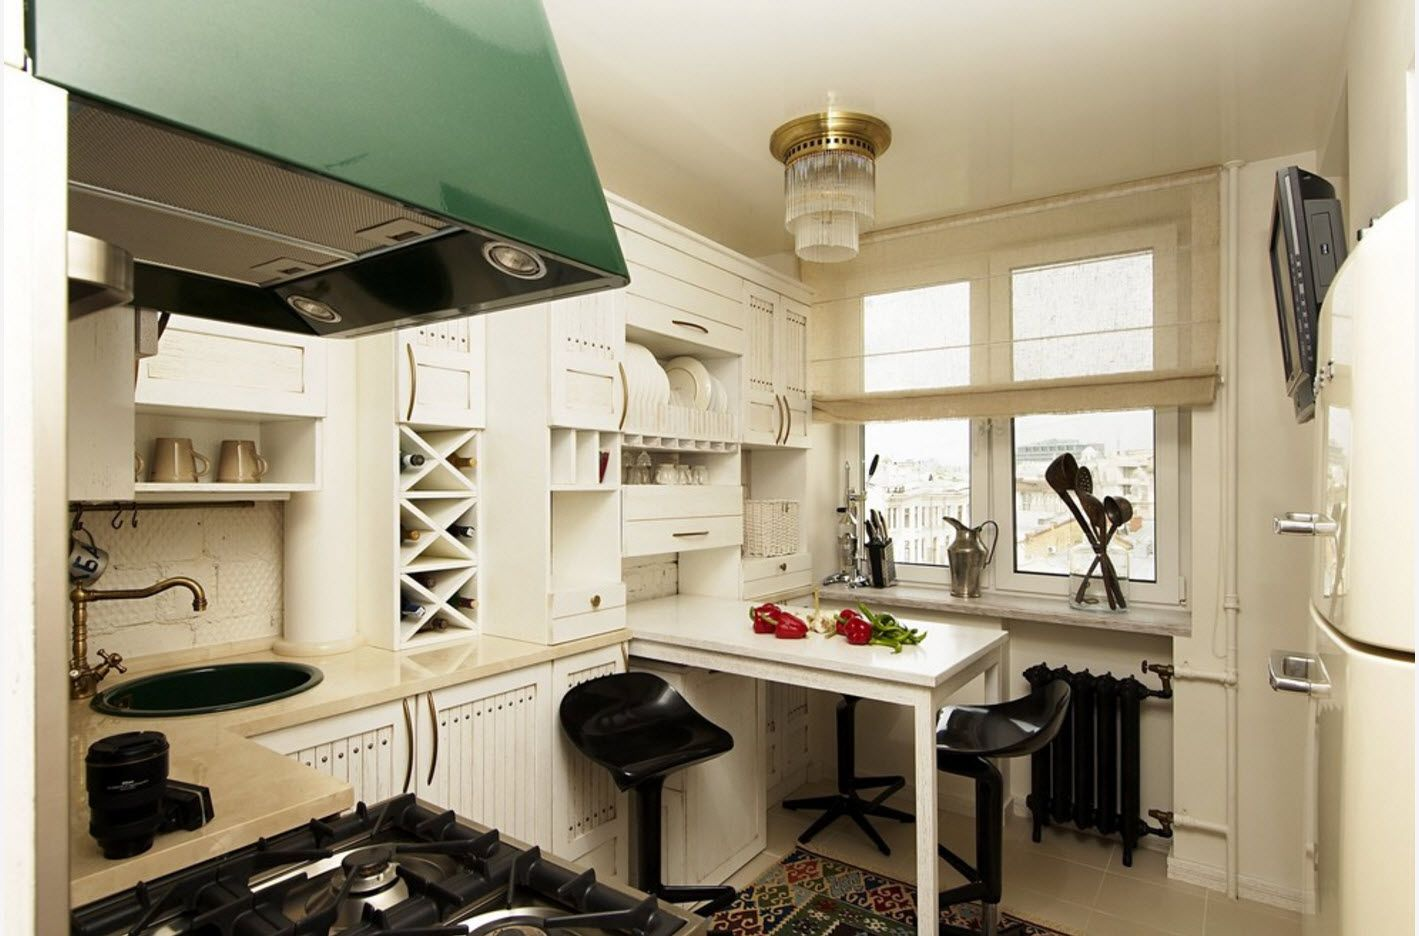 Малък кухненски интериор